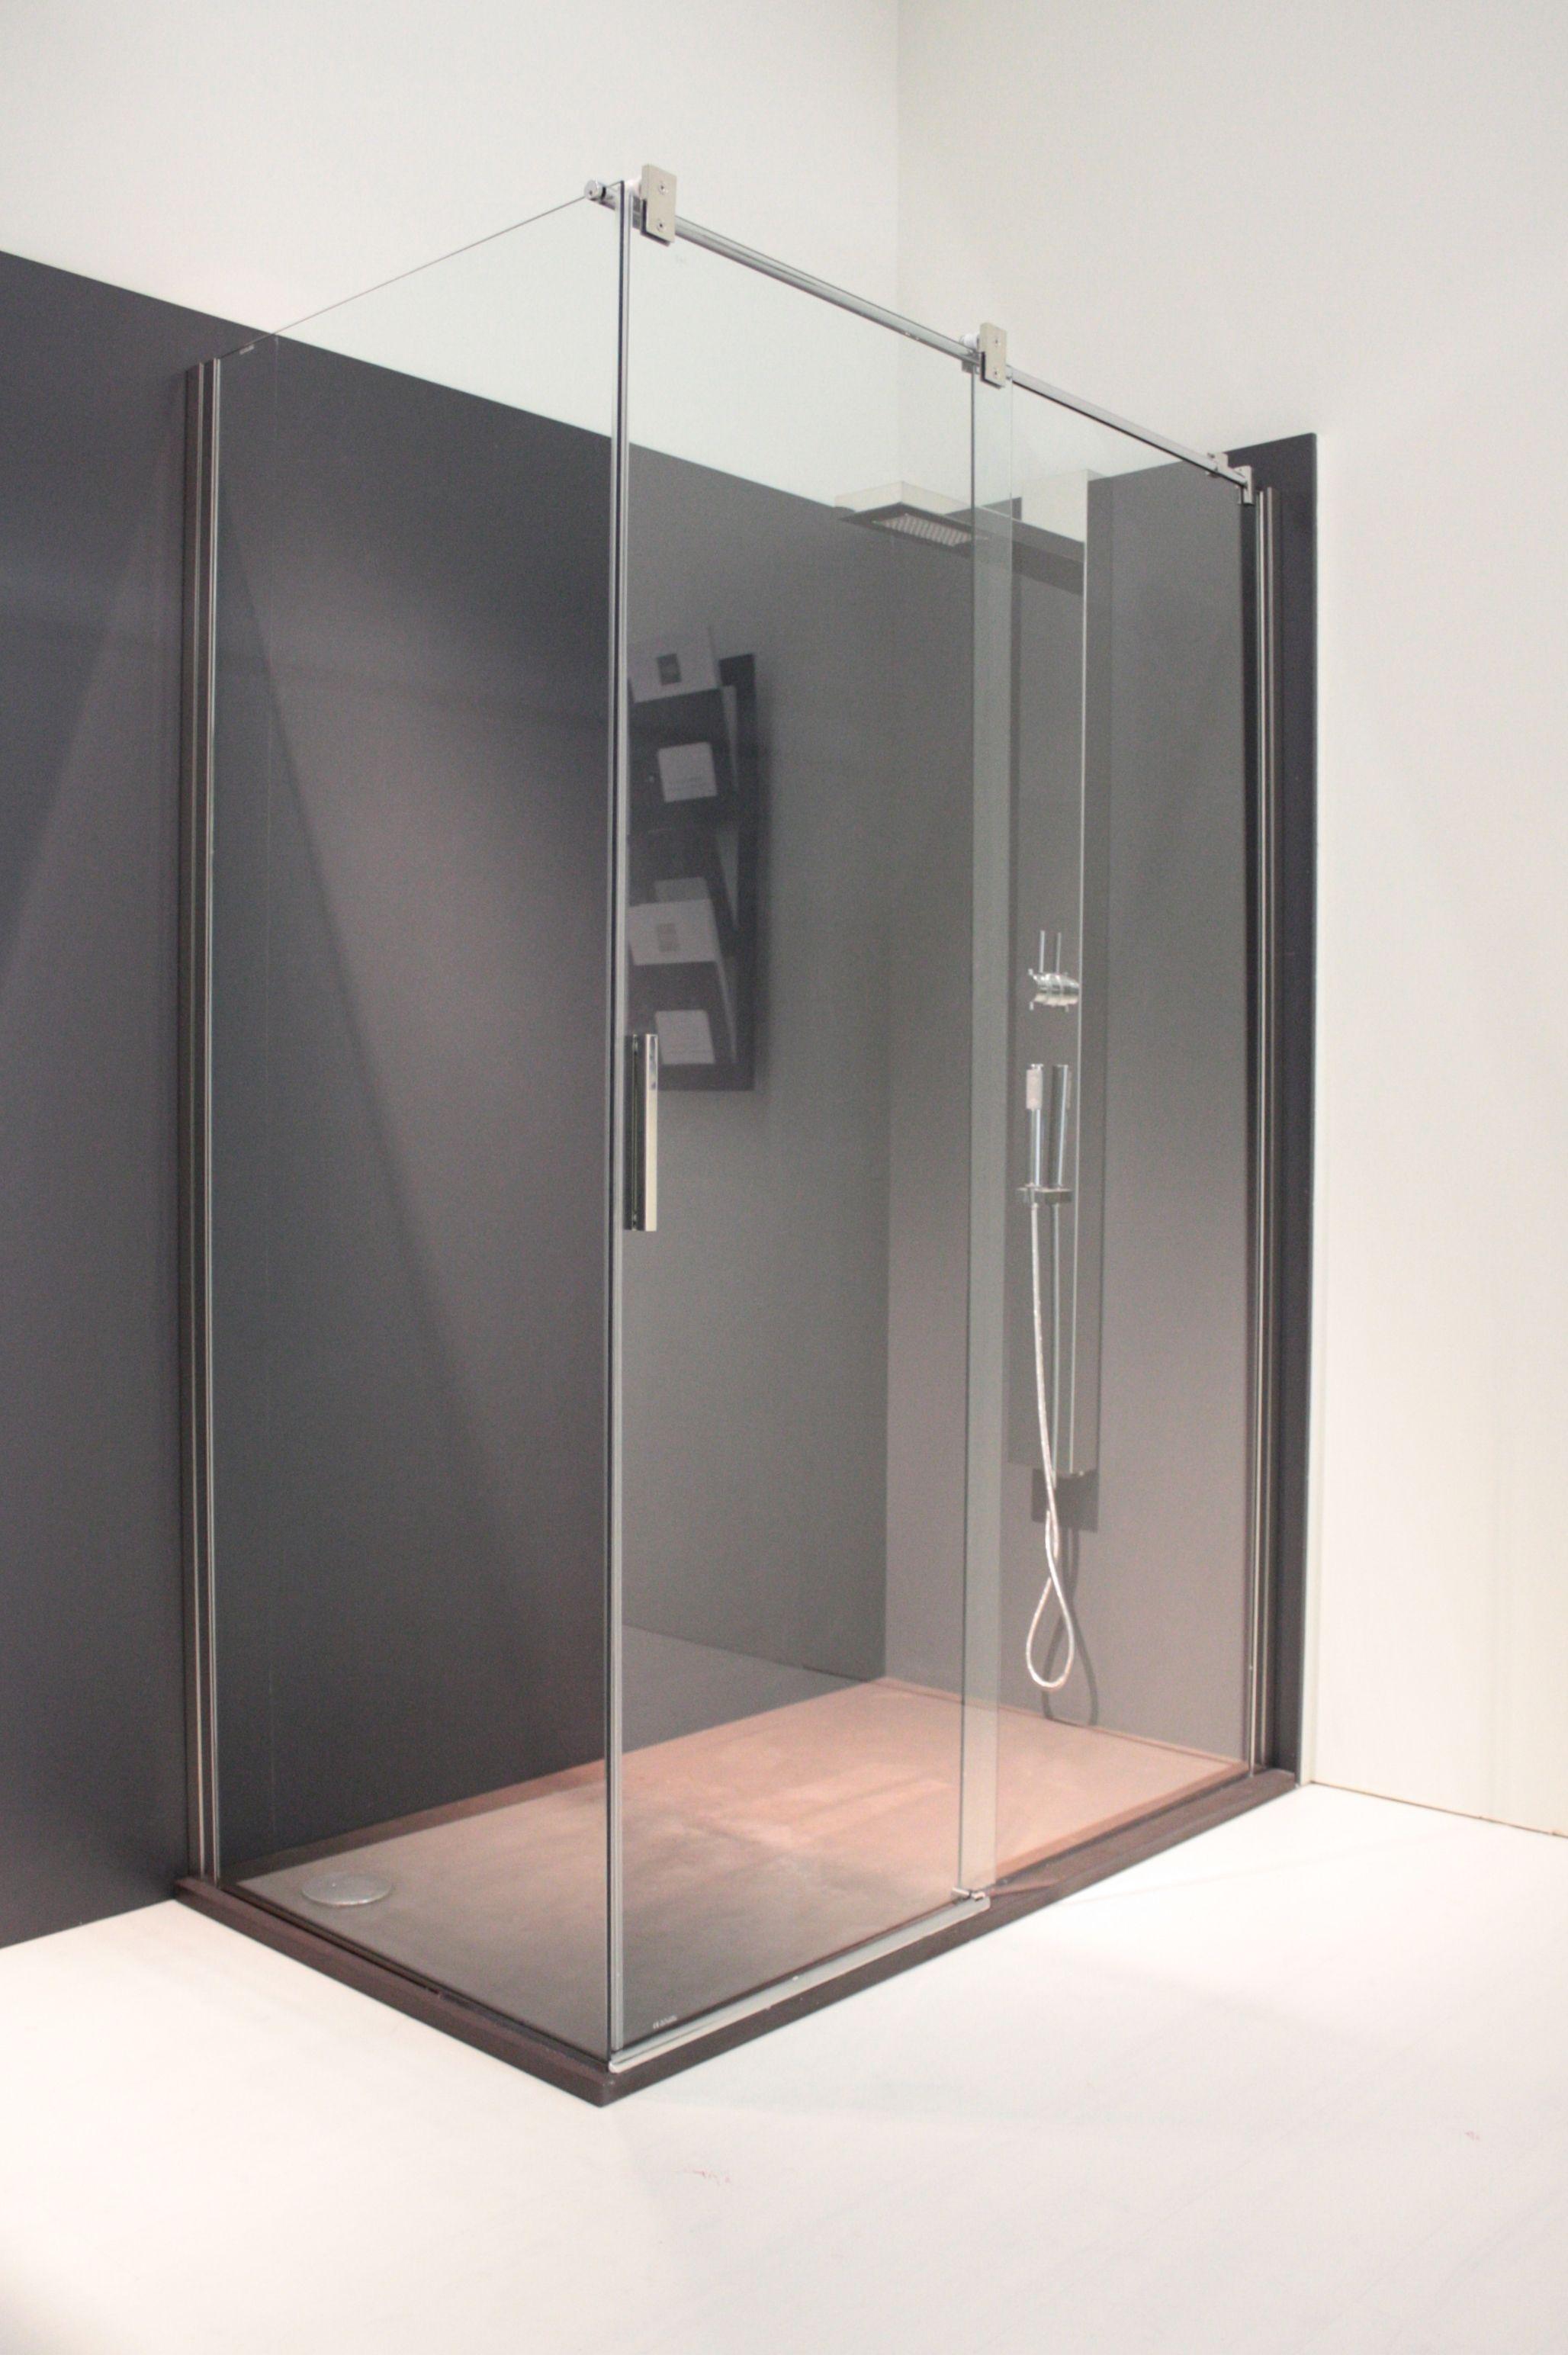 Galac6 Slide Collection Sliding Door Shower Enclosure Bathroom